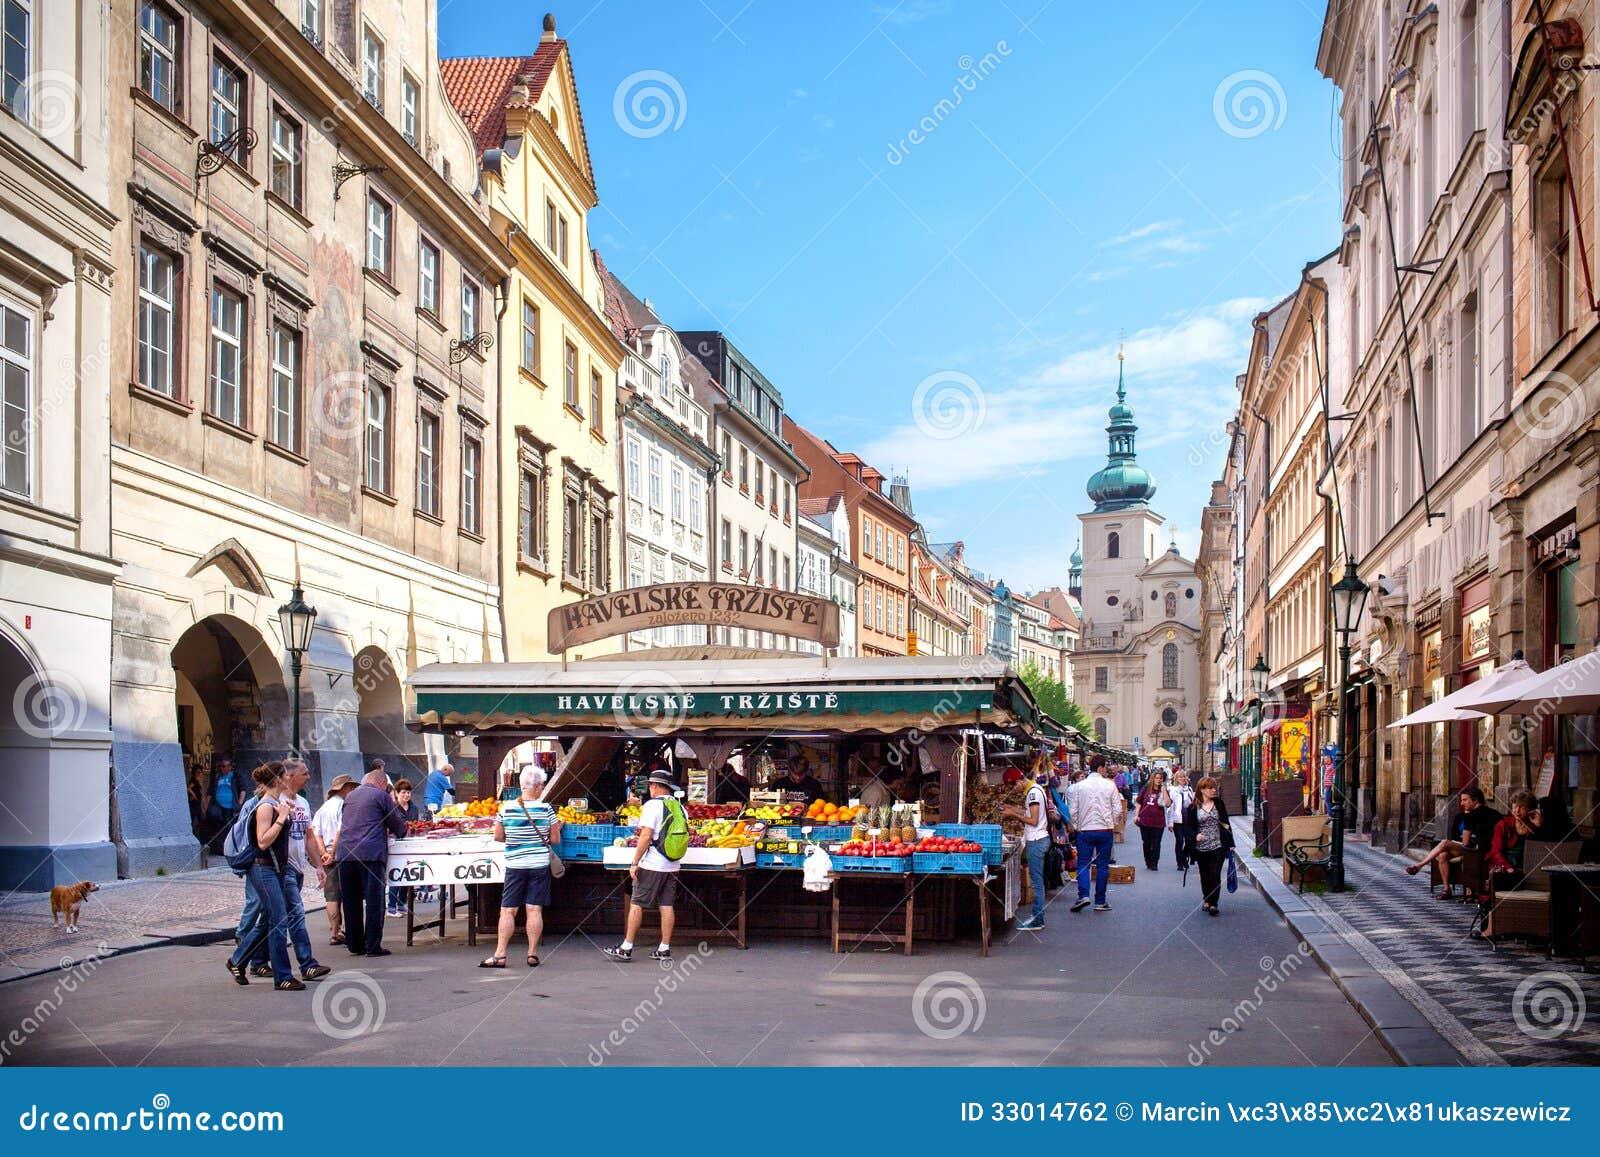 Havelske trziste havels market permanent marked in the for Prague center